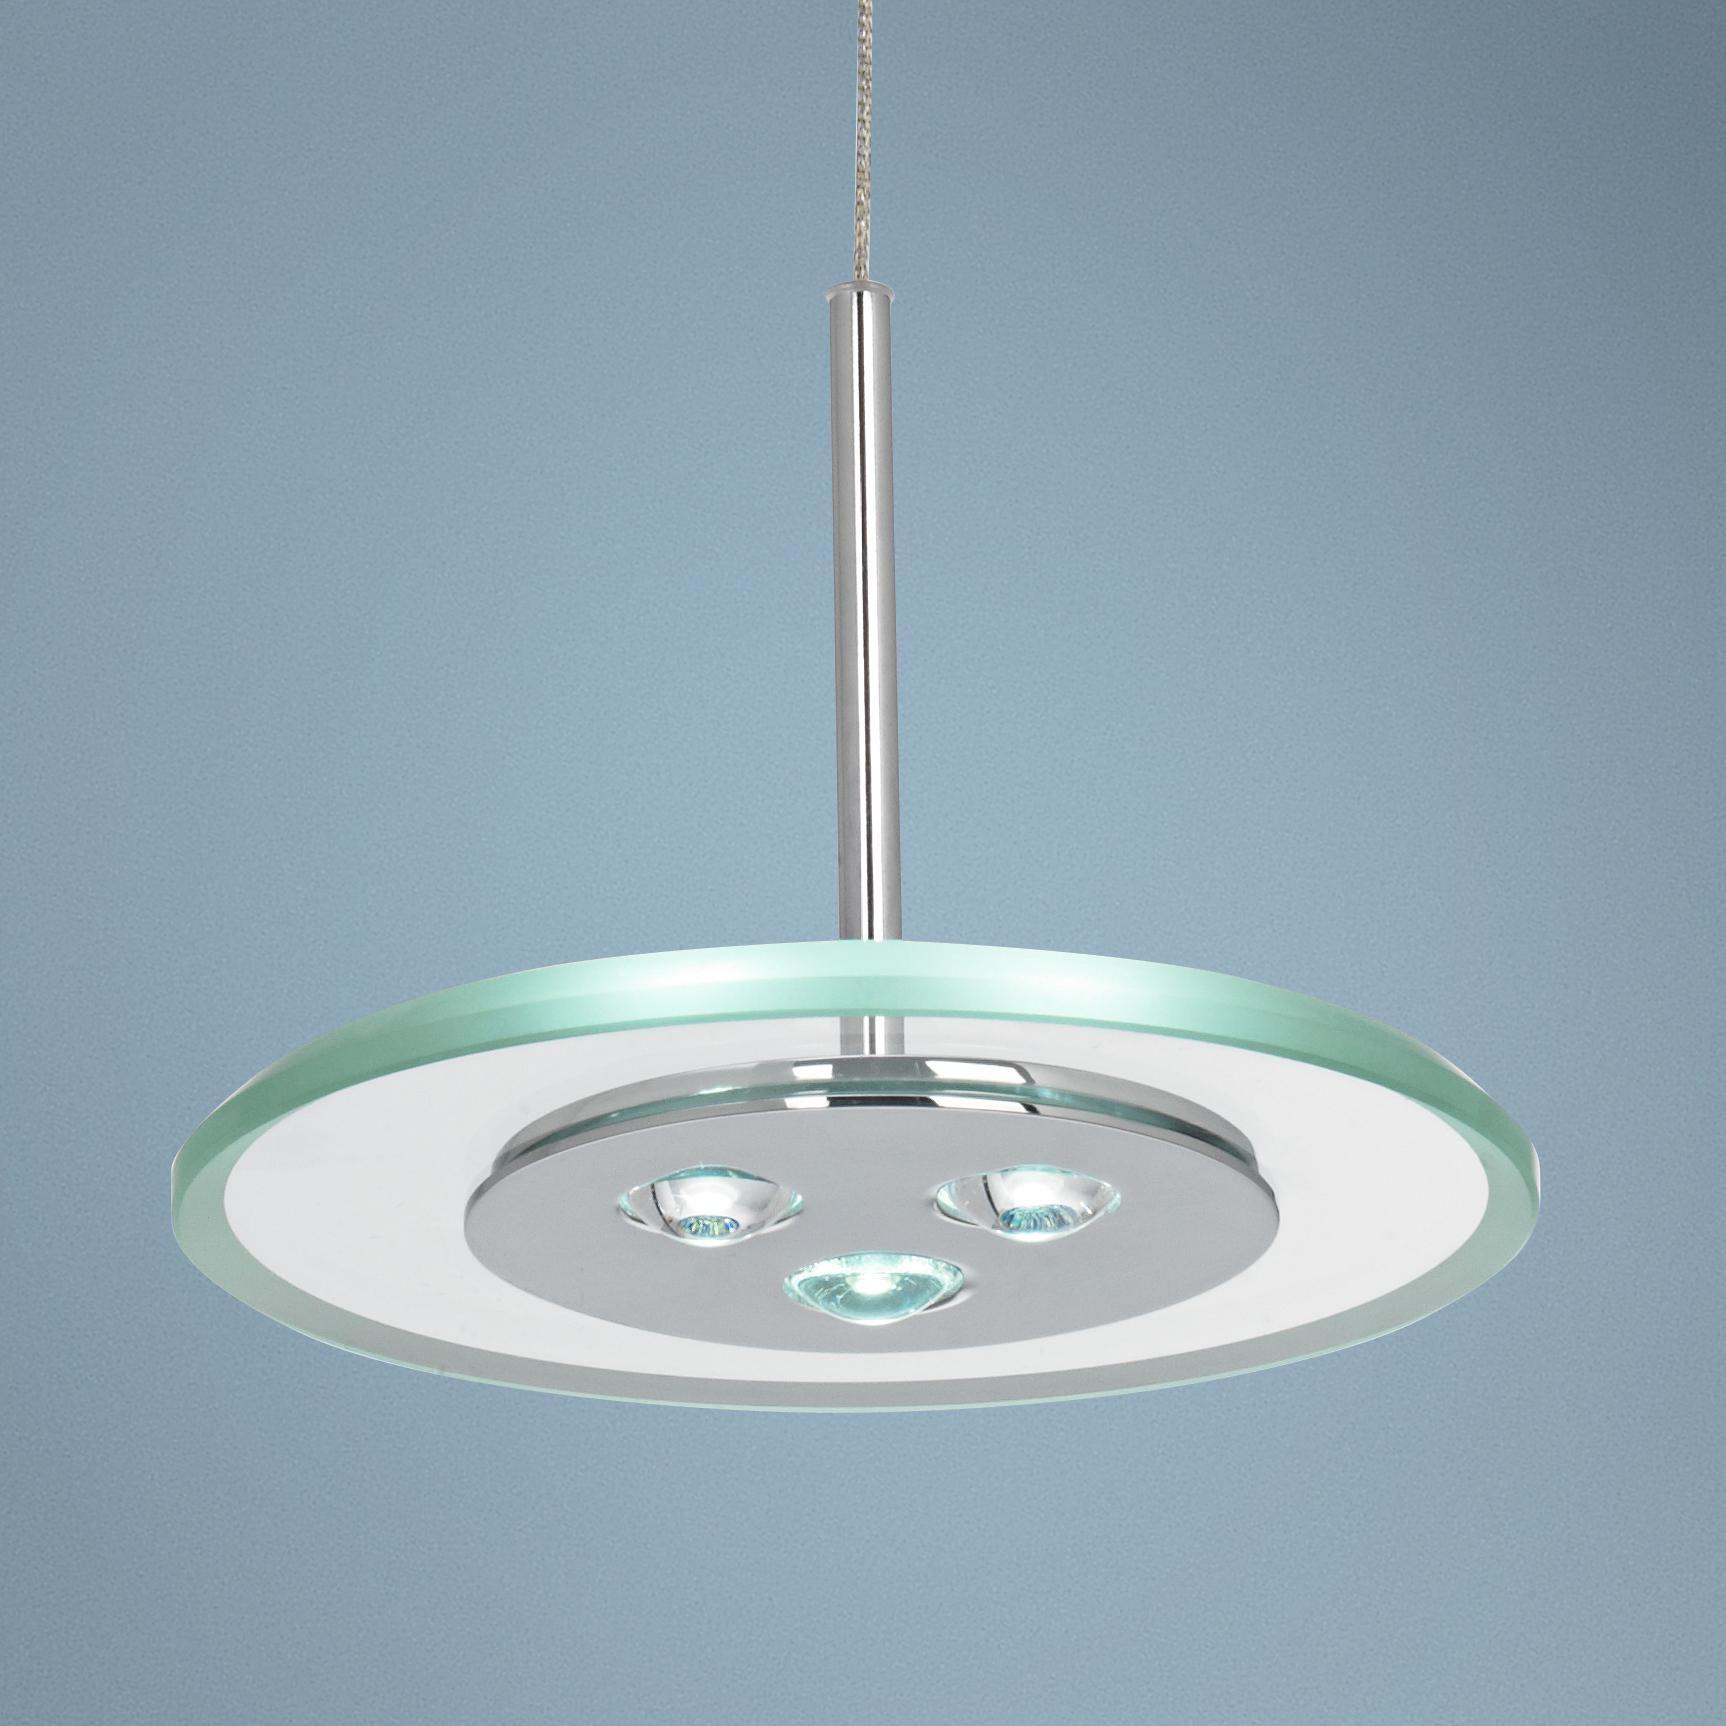 possini euro design lighting. Possini Euro Design Glass Disk 3-LED Mini Pendant Light - Lighting N